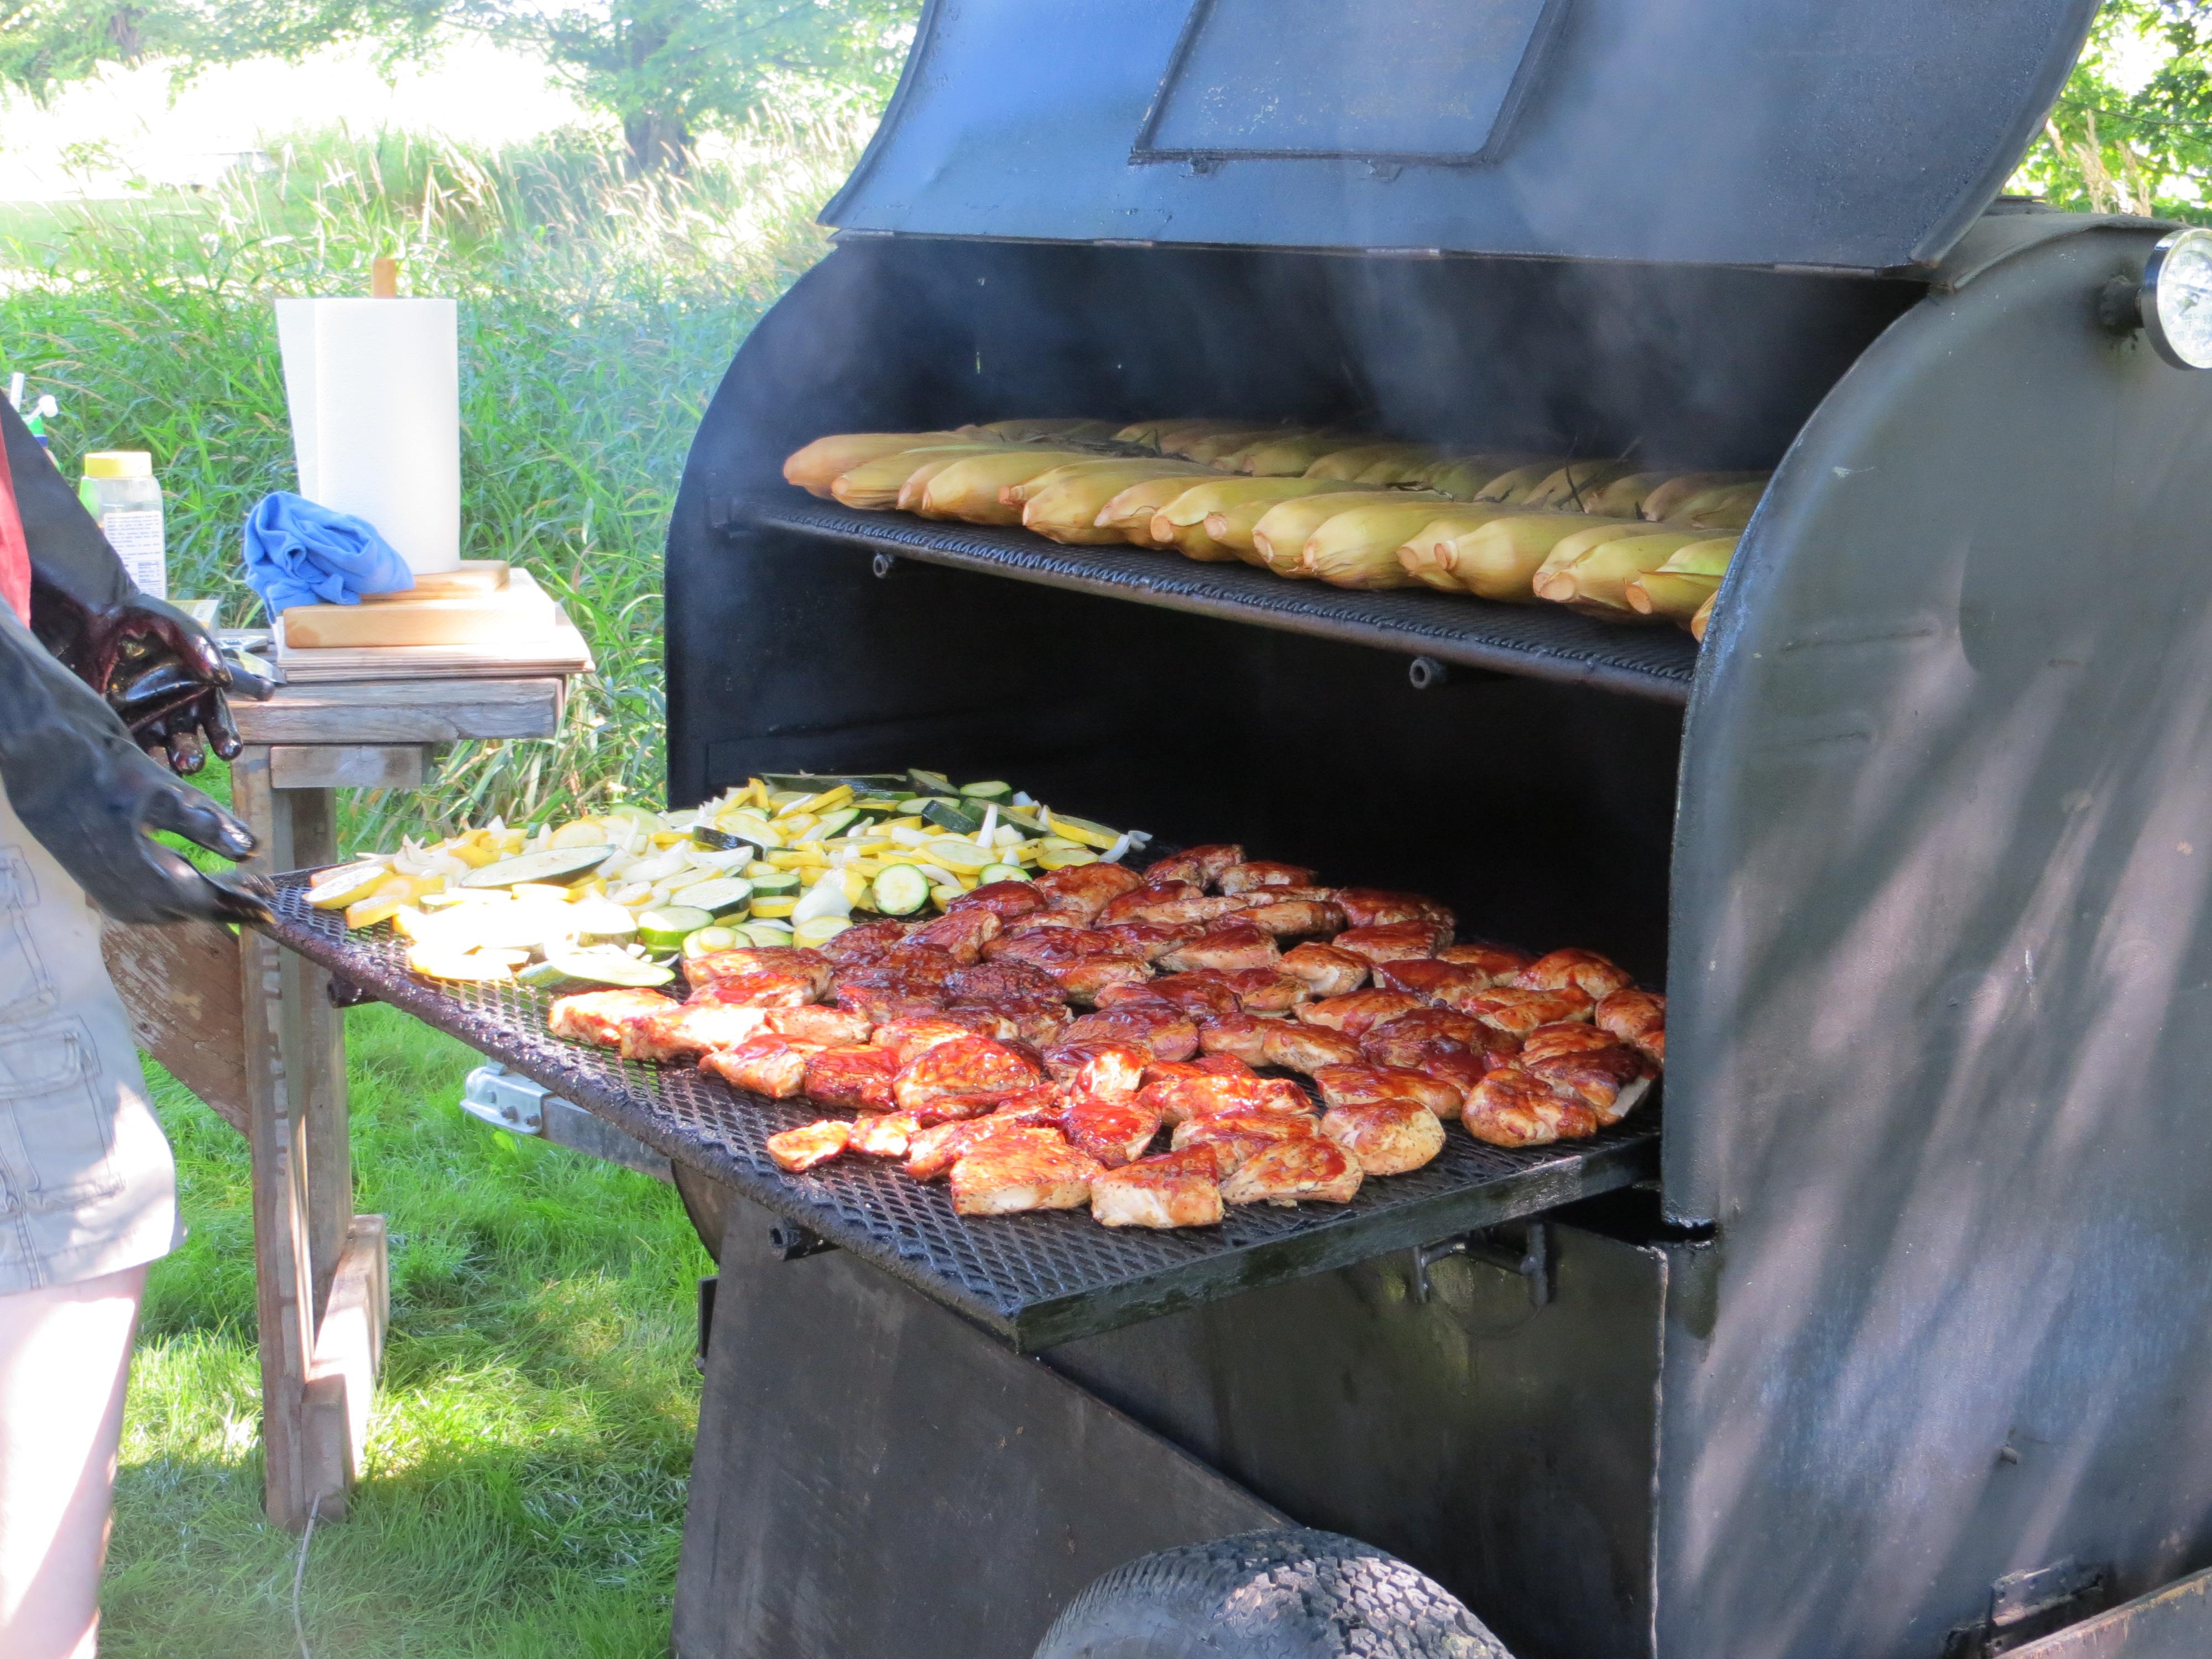 barbecue at the Church Picnic